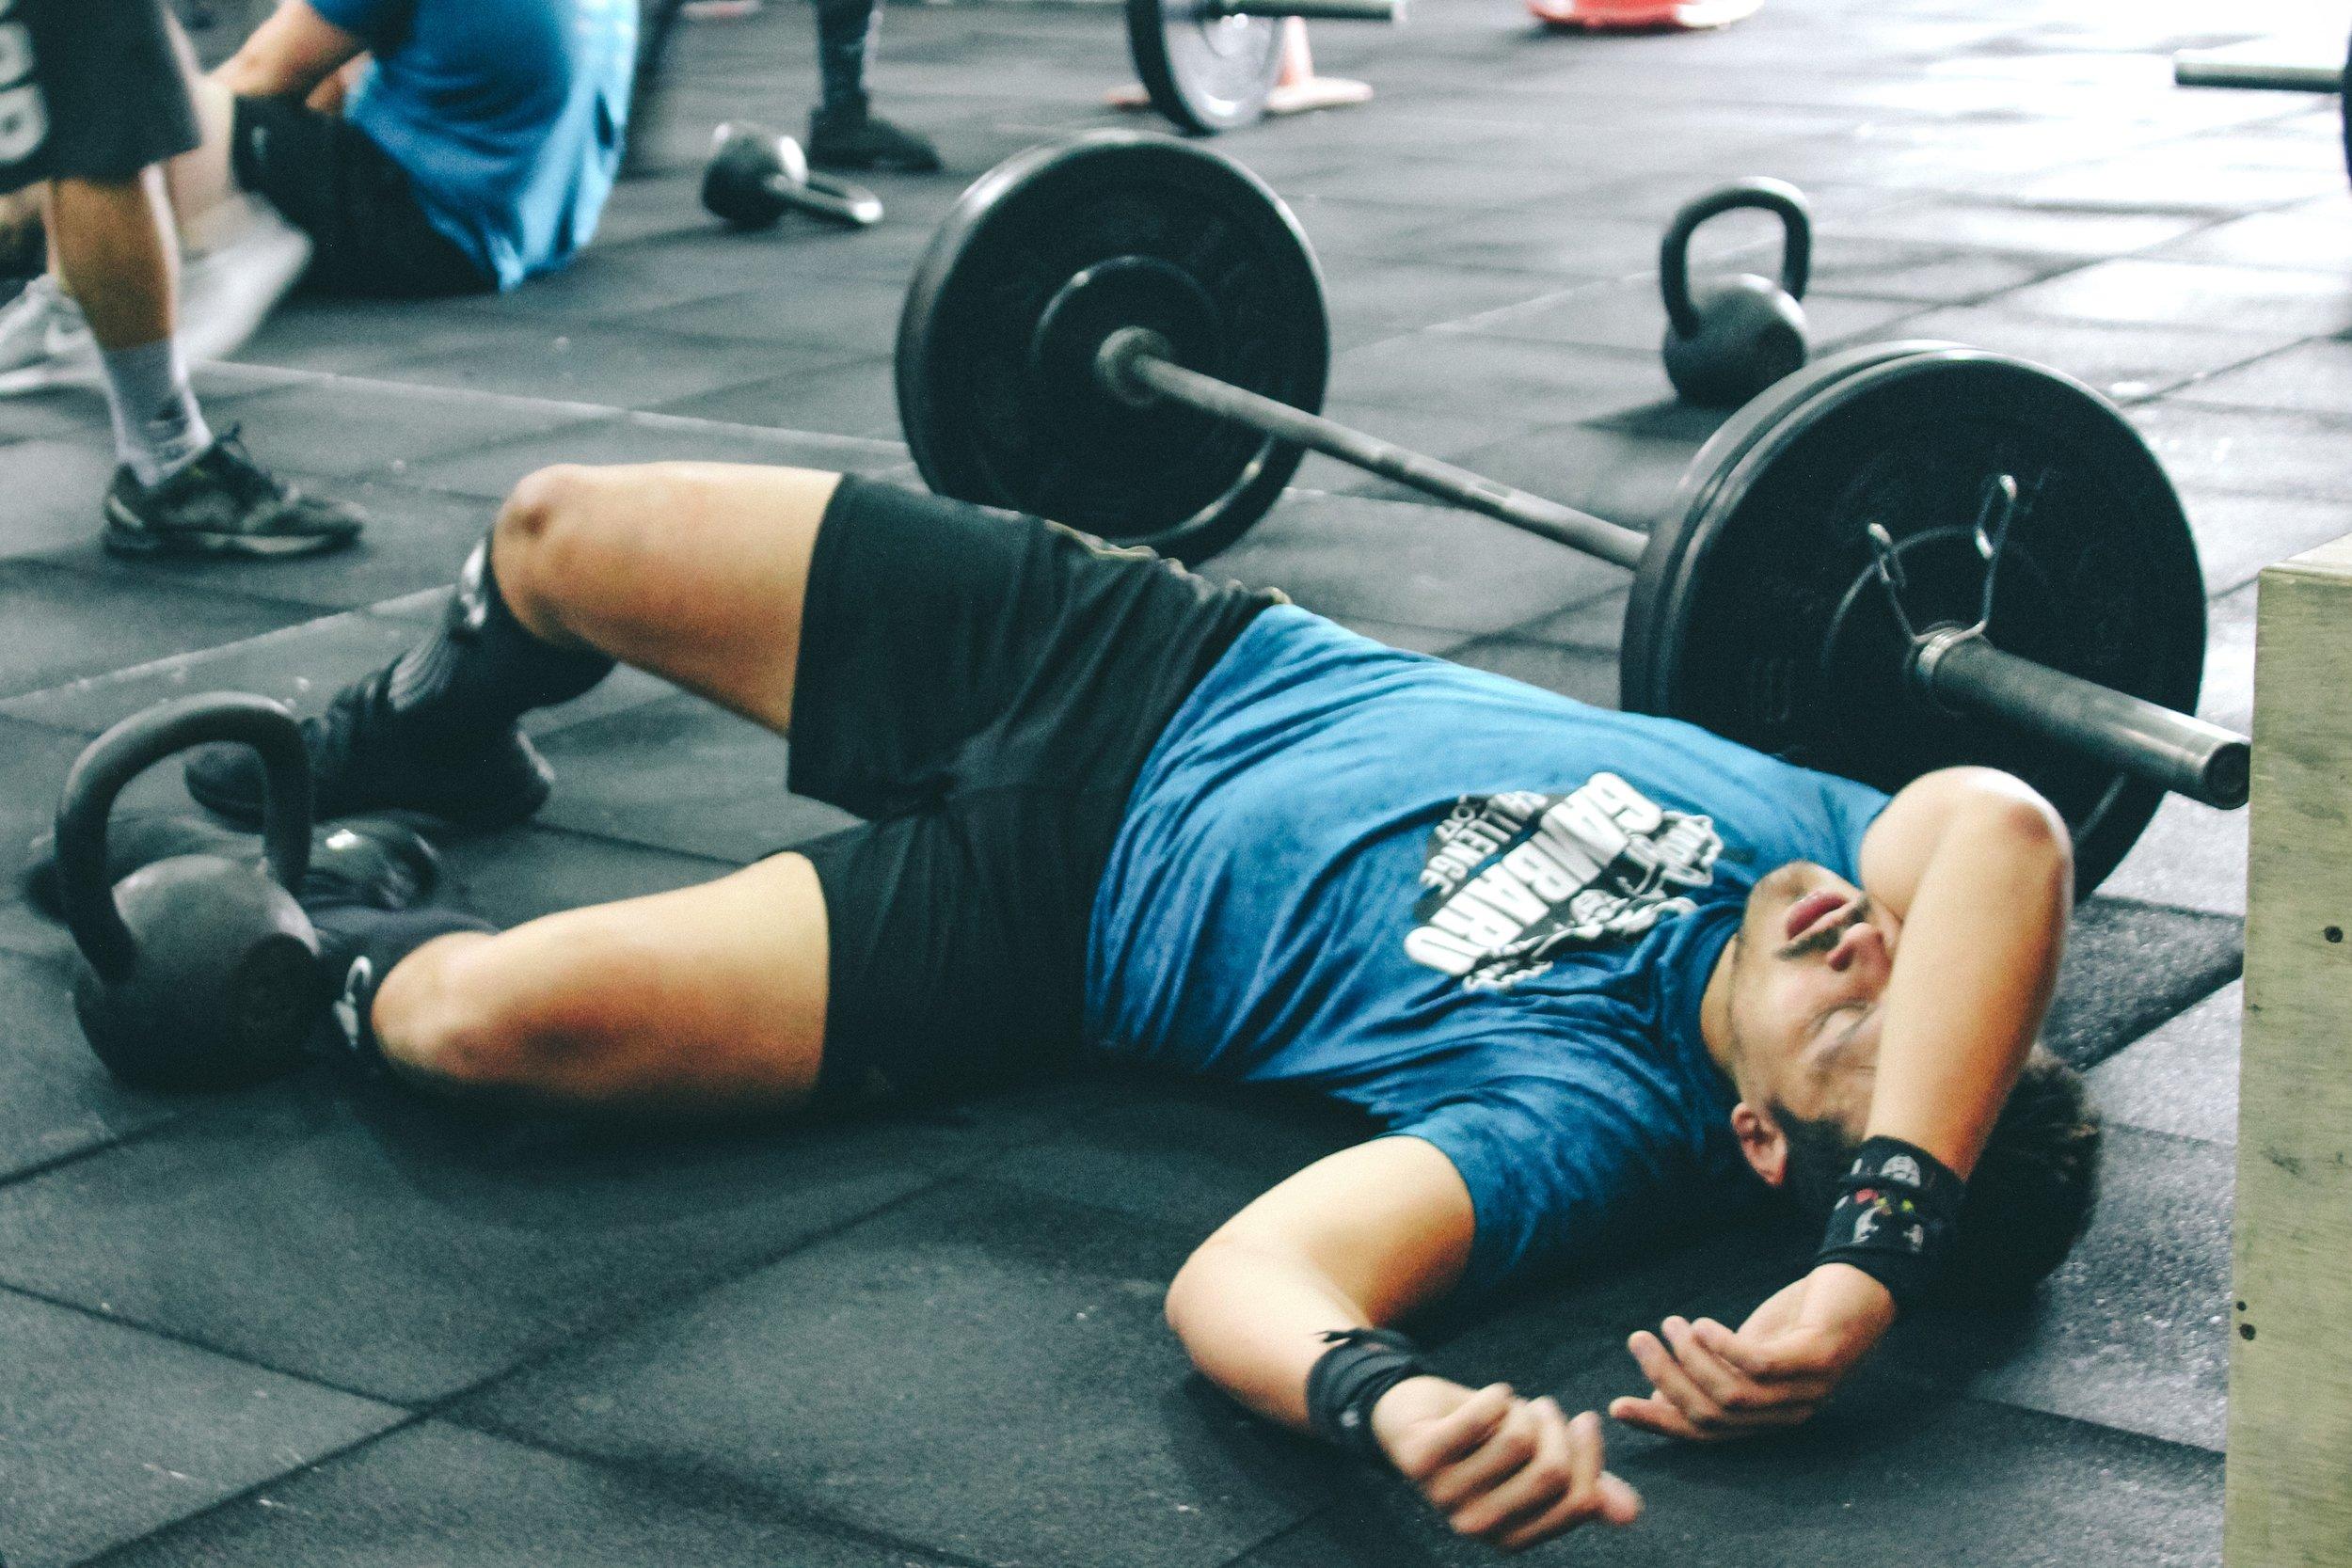 activity-adult-athlete-703009.jpg